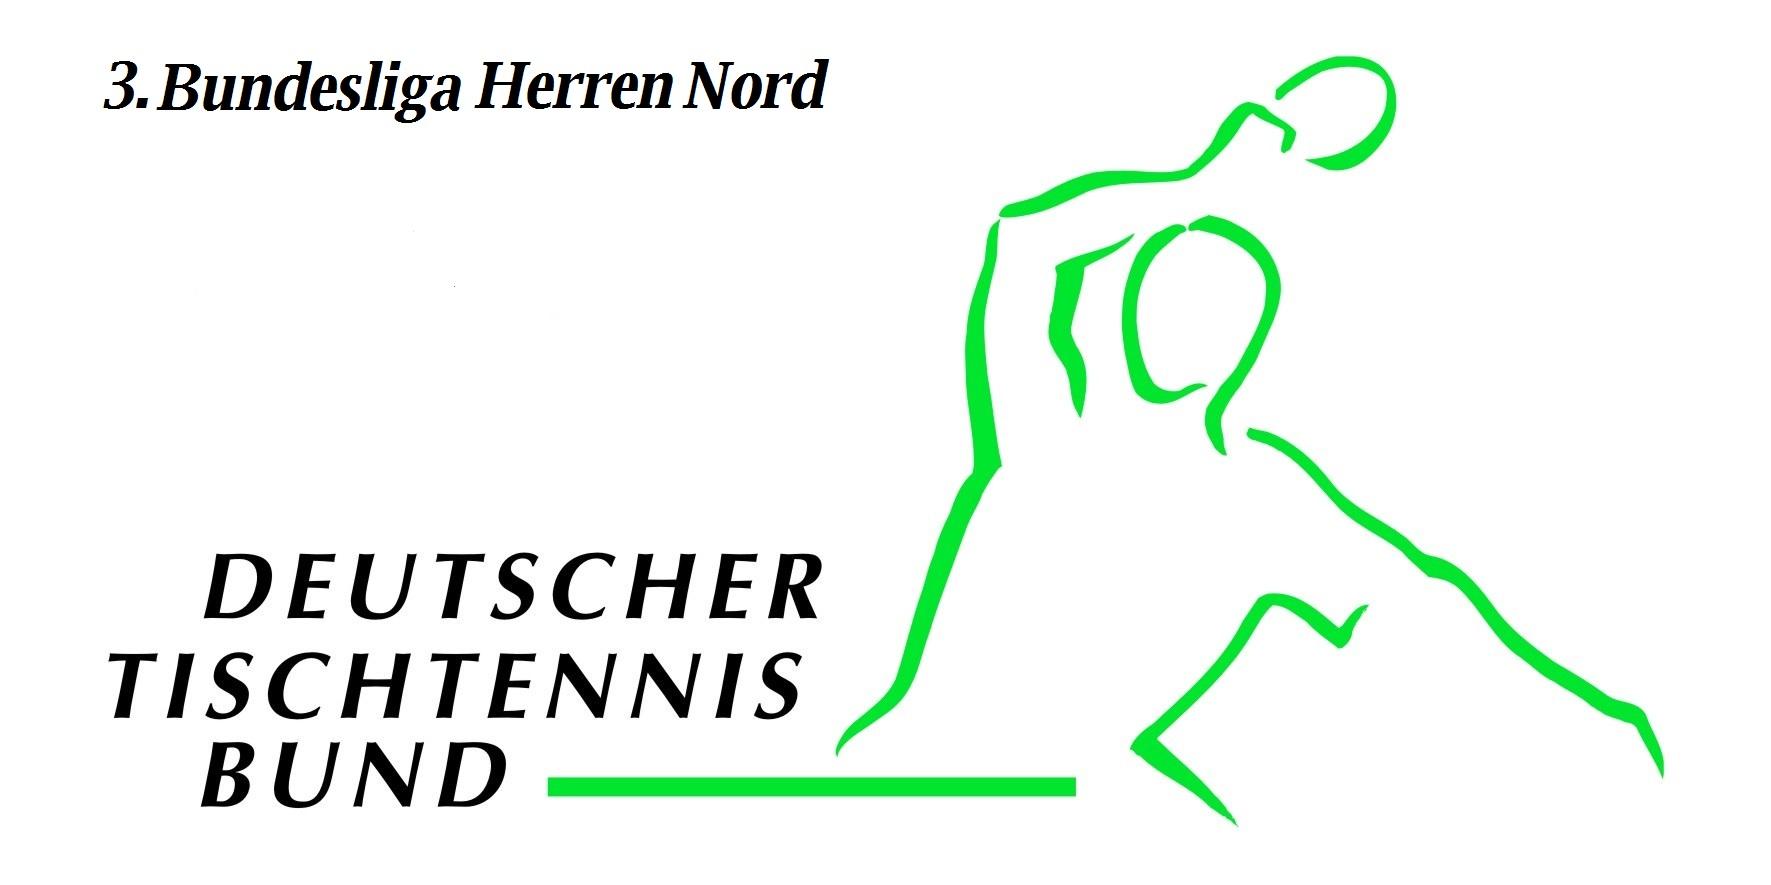 images/artikel/14-15/DTTB 3. Bundesliga Herren Nord.jpg